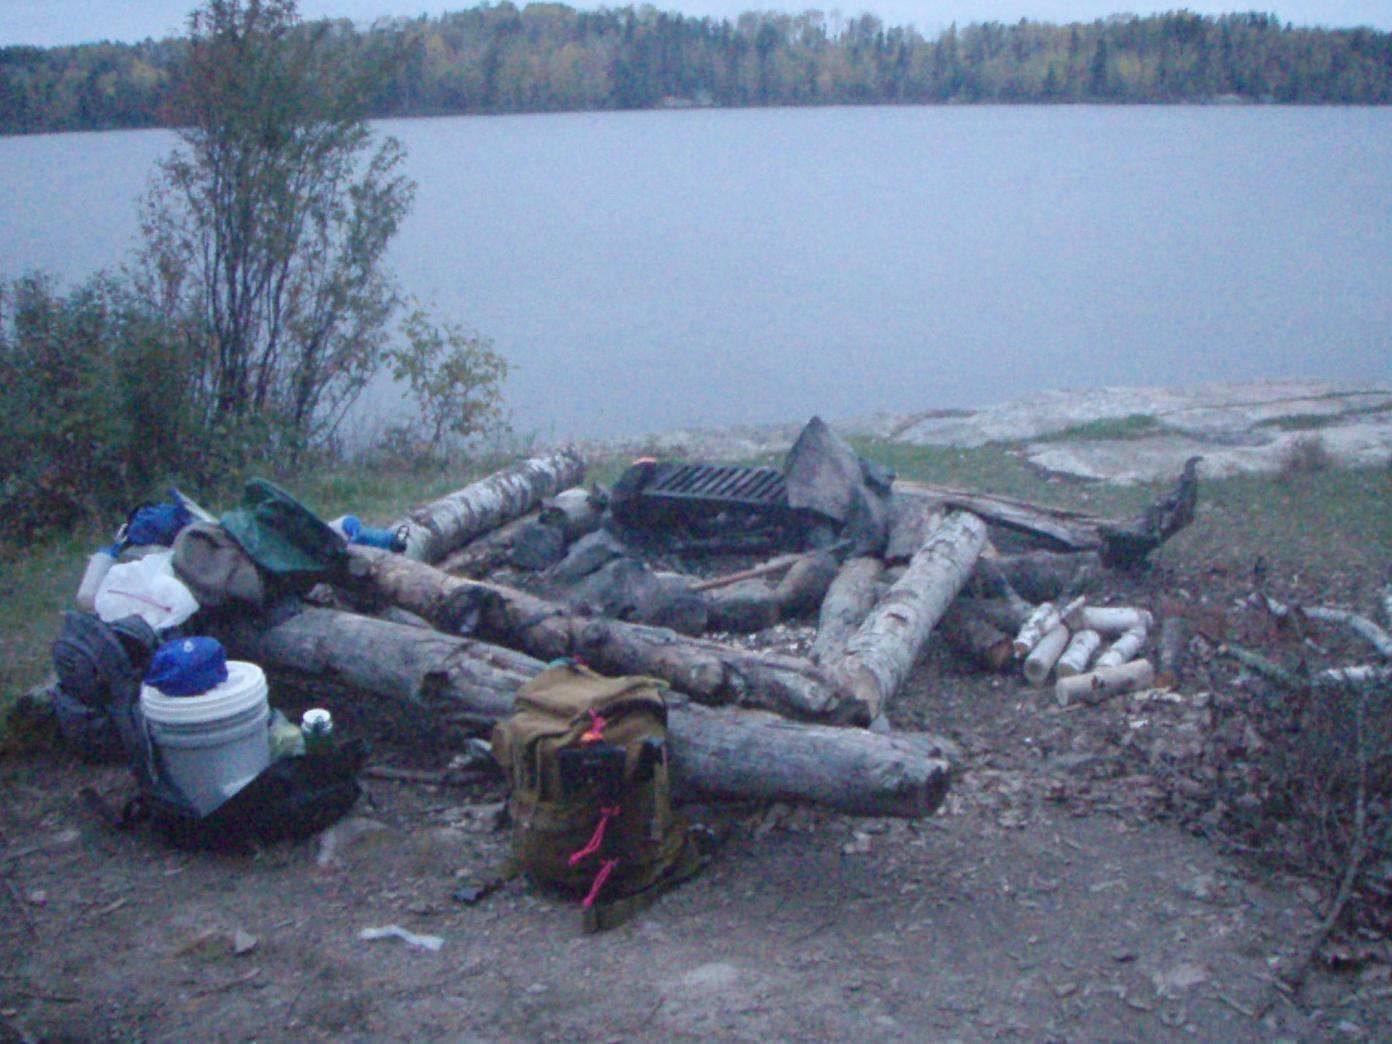 Camping Toilet Gamma : Bwca food pack or barrel? boundary waters gear forum